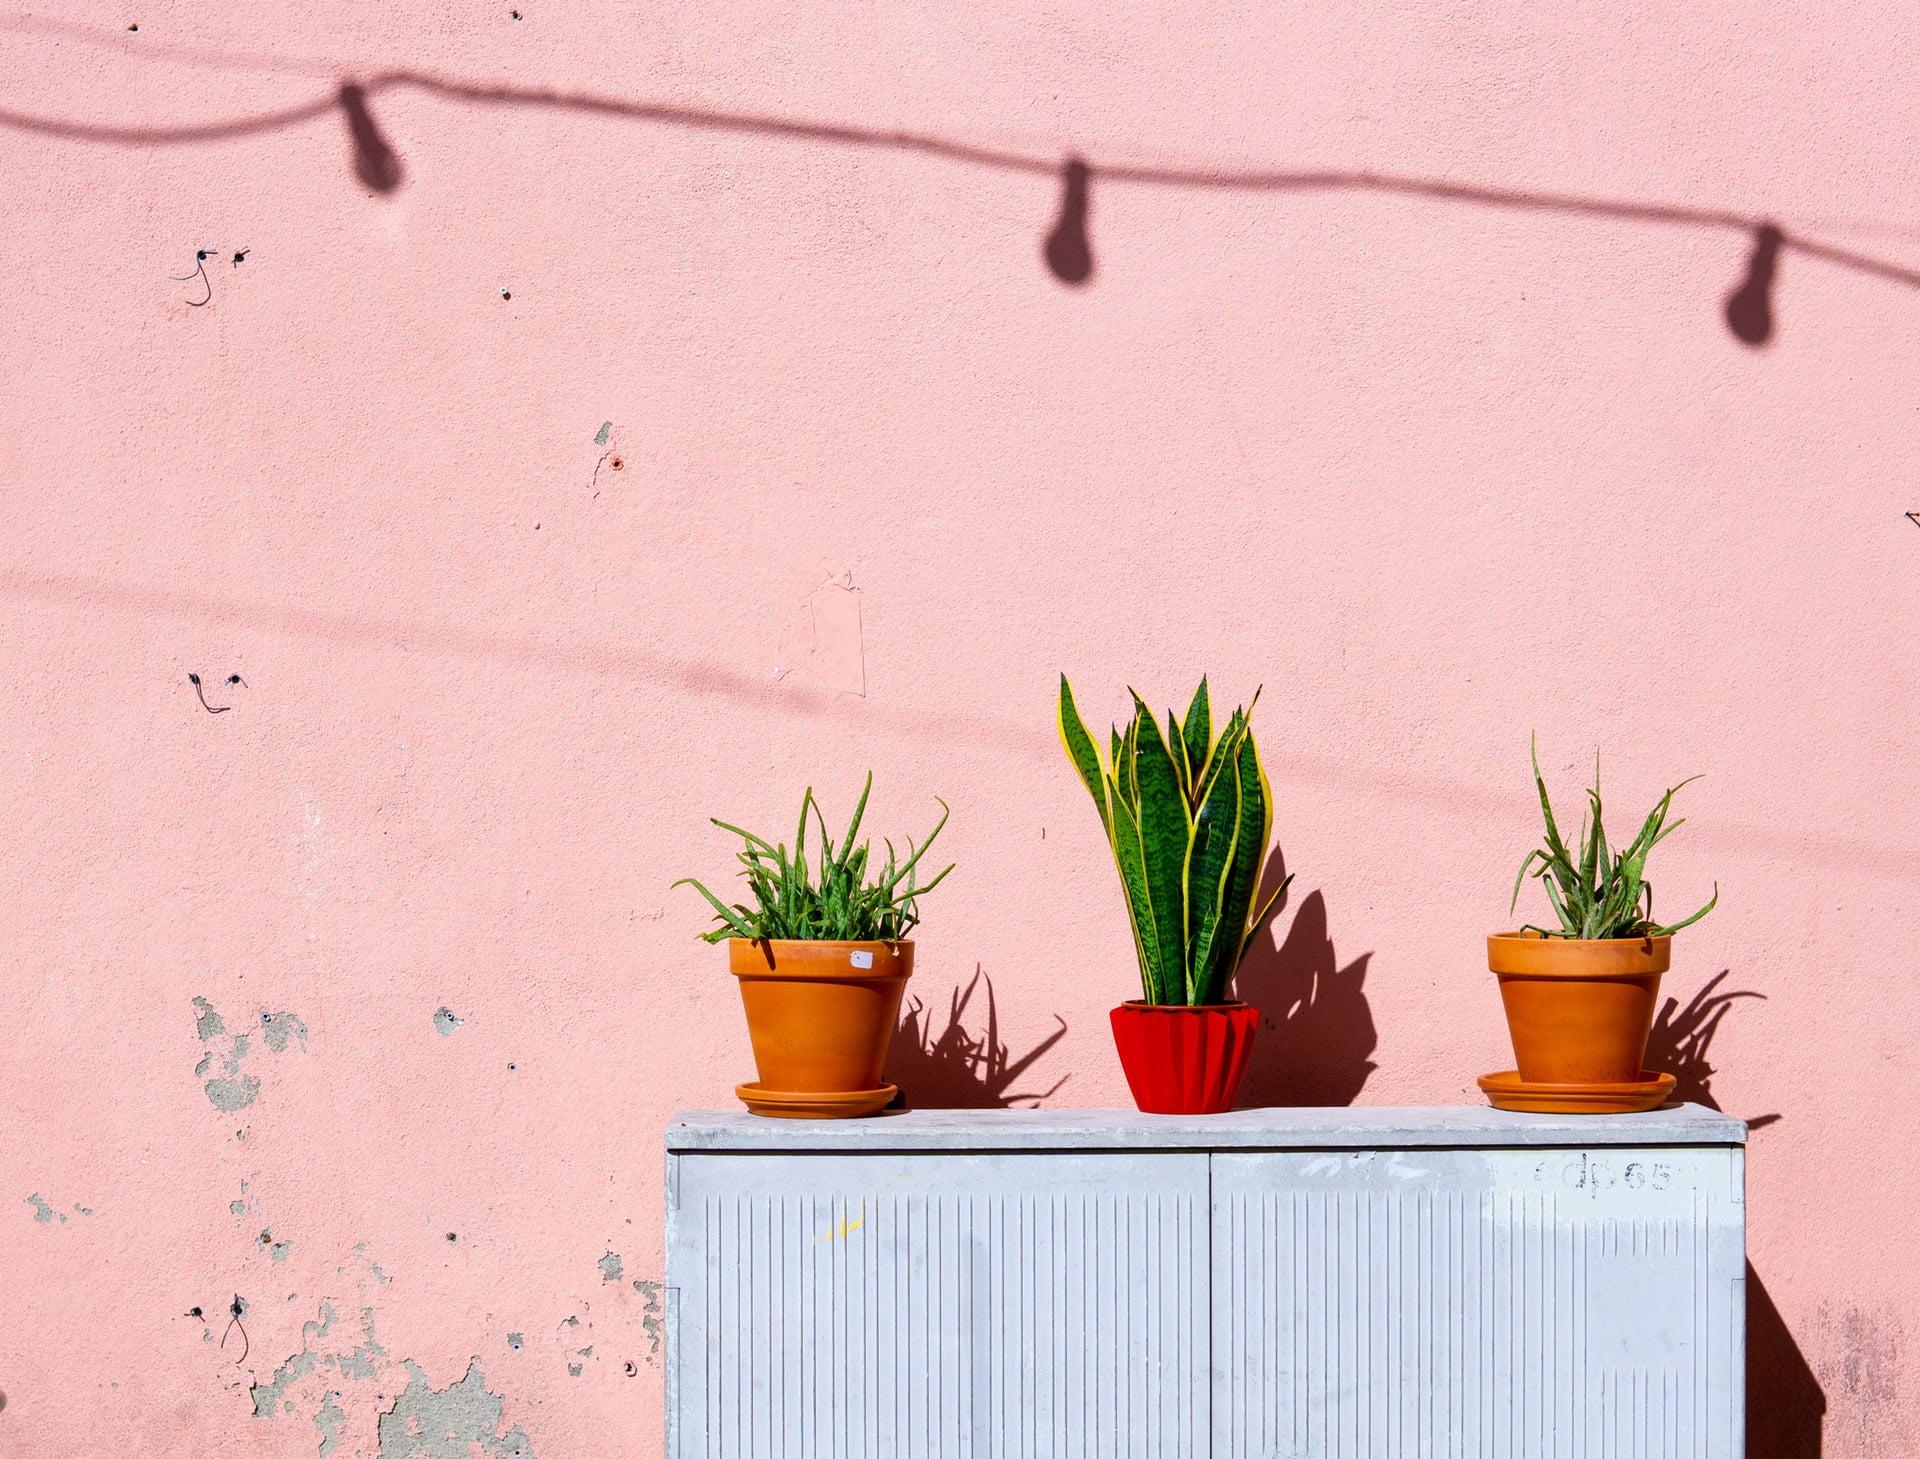 aloe vera bright flora sunny wall pink 我願意啊|日堯詩選